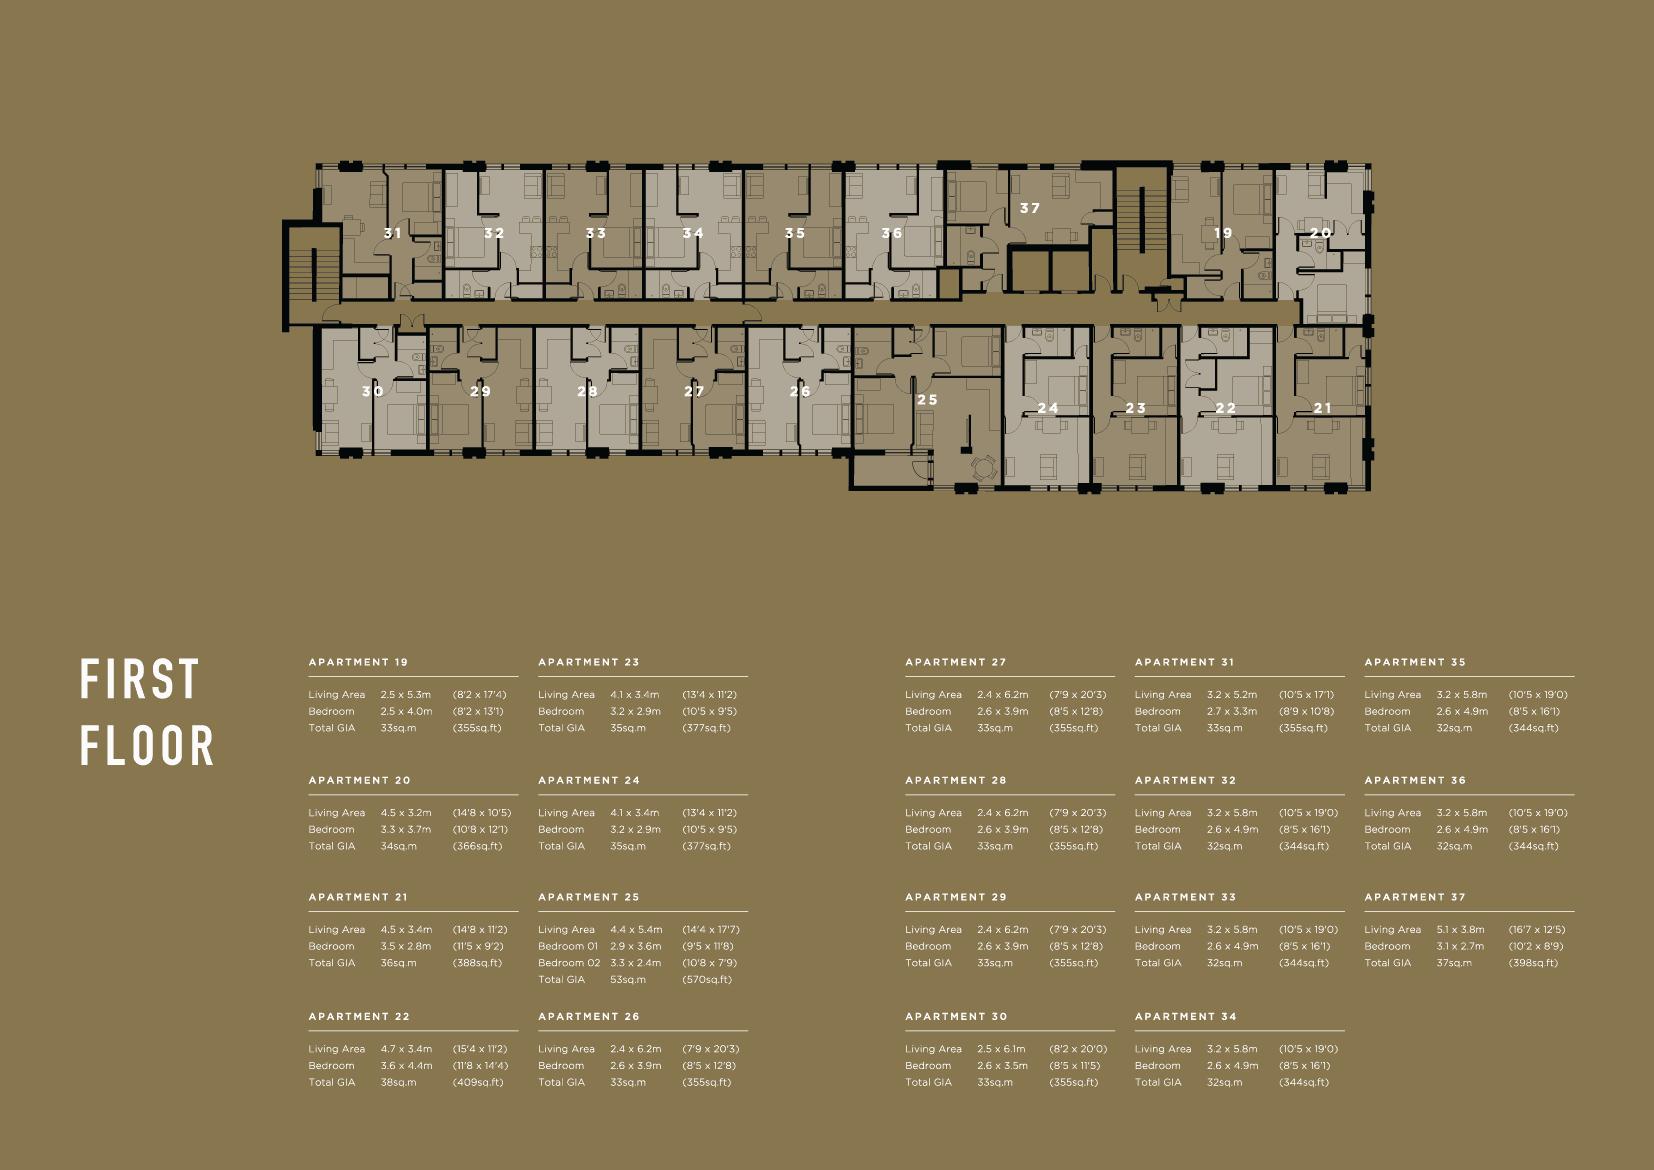 Floor 1 - Furness House